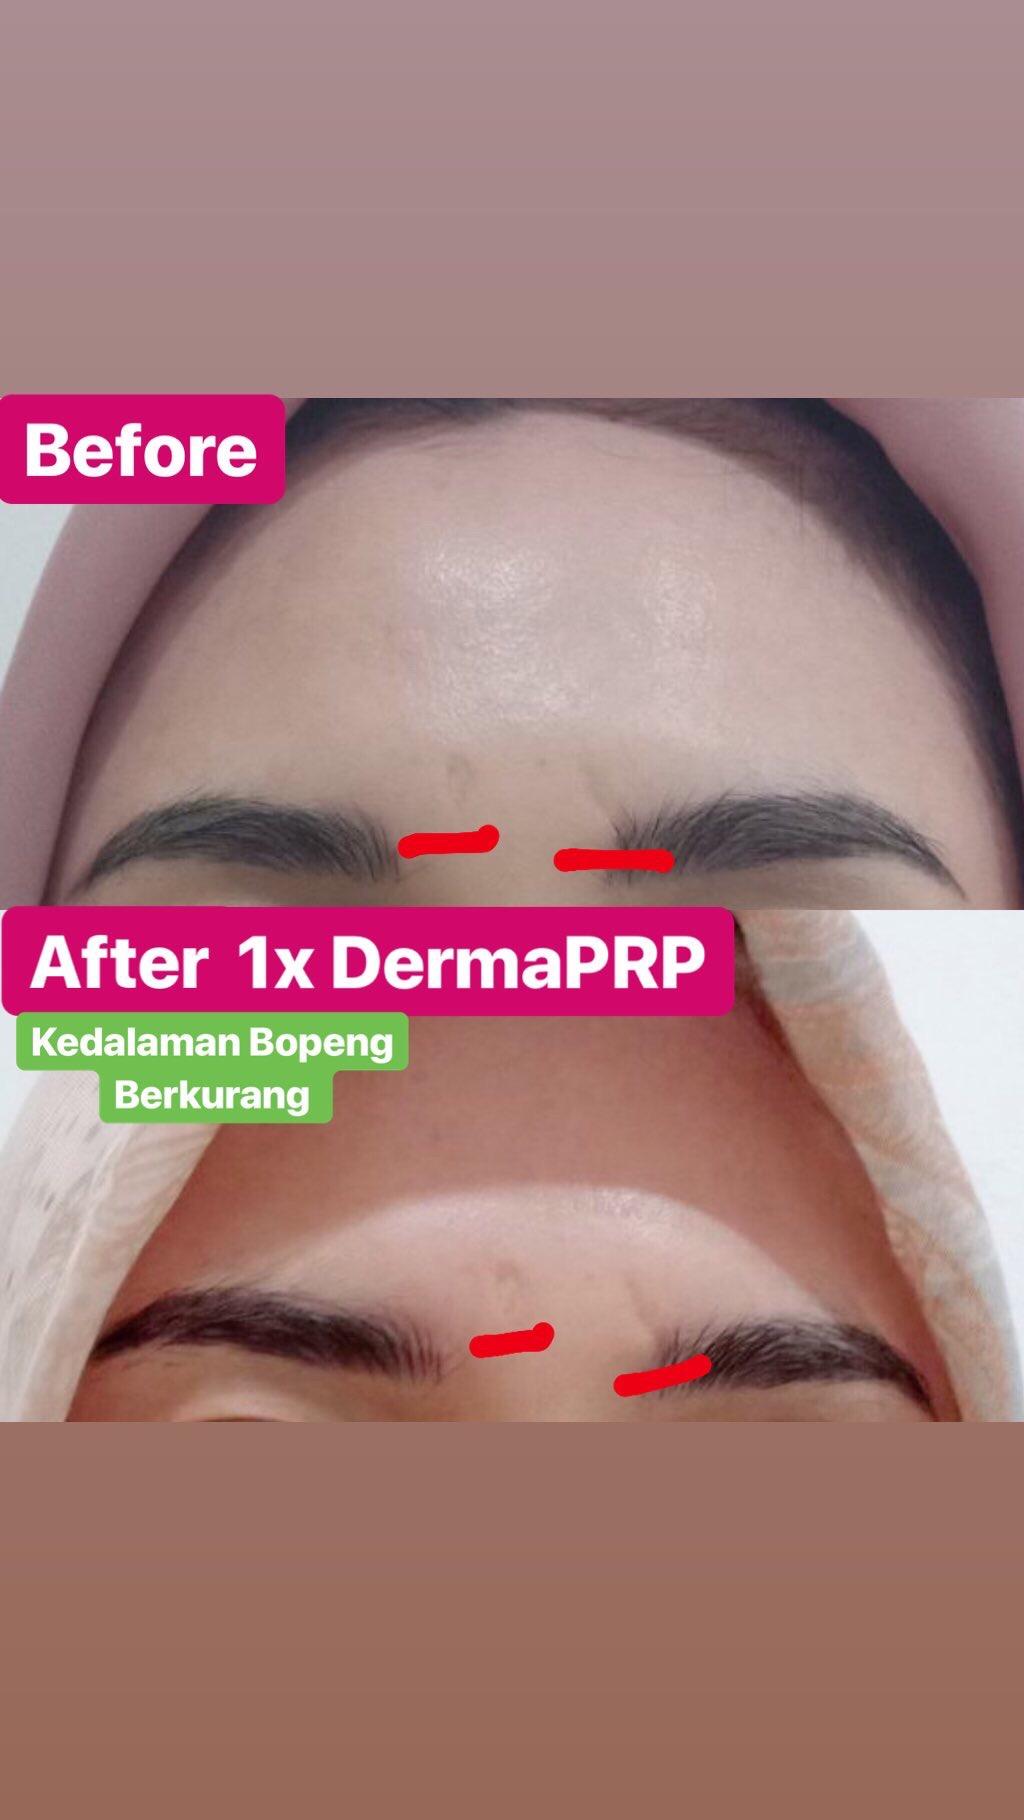 Hasil Treatment Derma PRP untuk menghilangkan bopeng